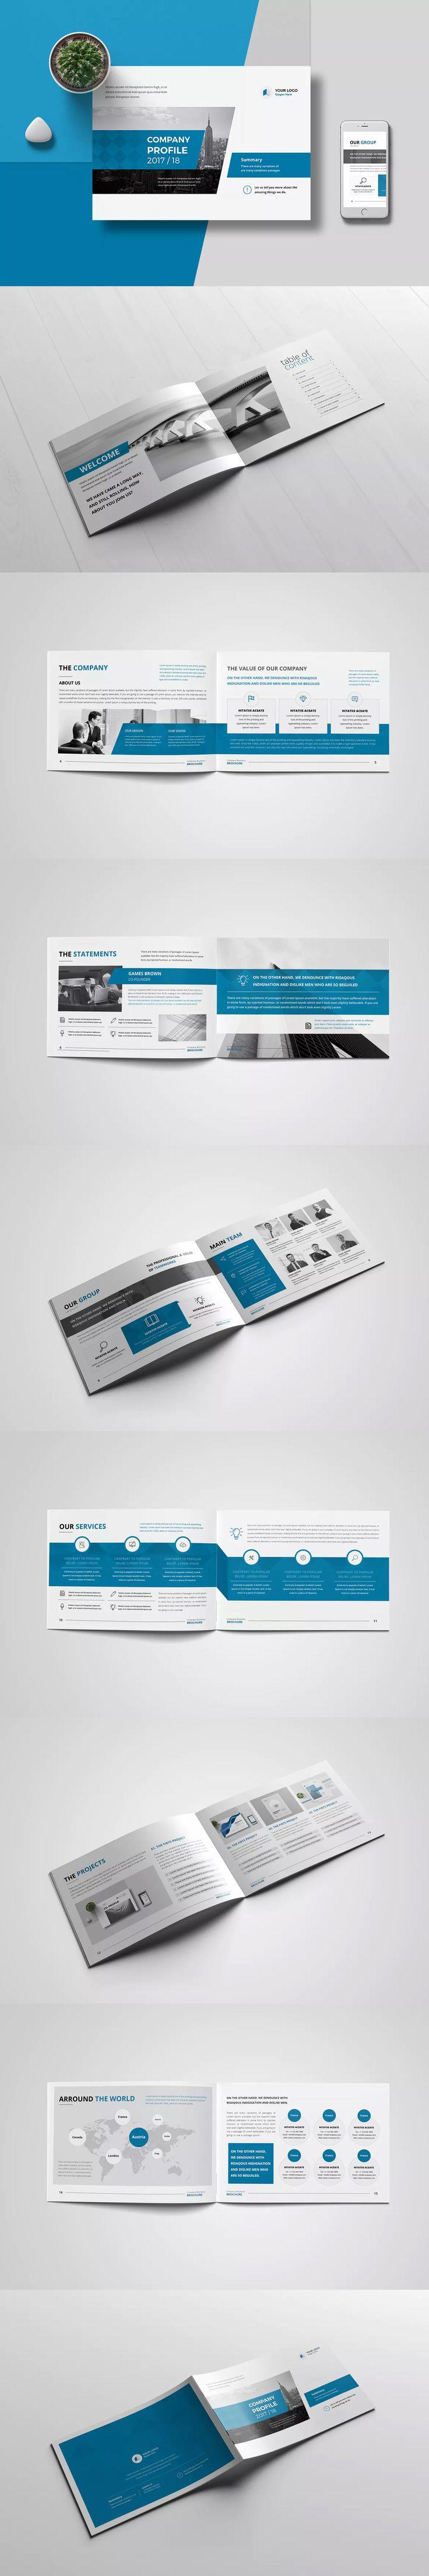 Company Profile 2017 Template INDD - A5